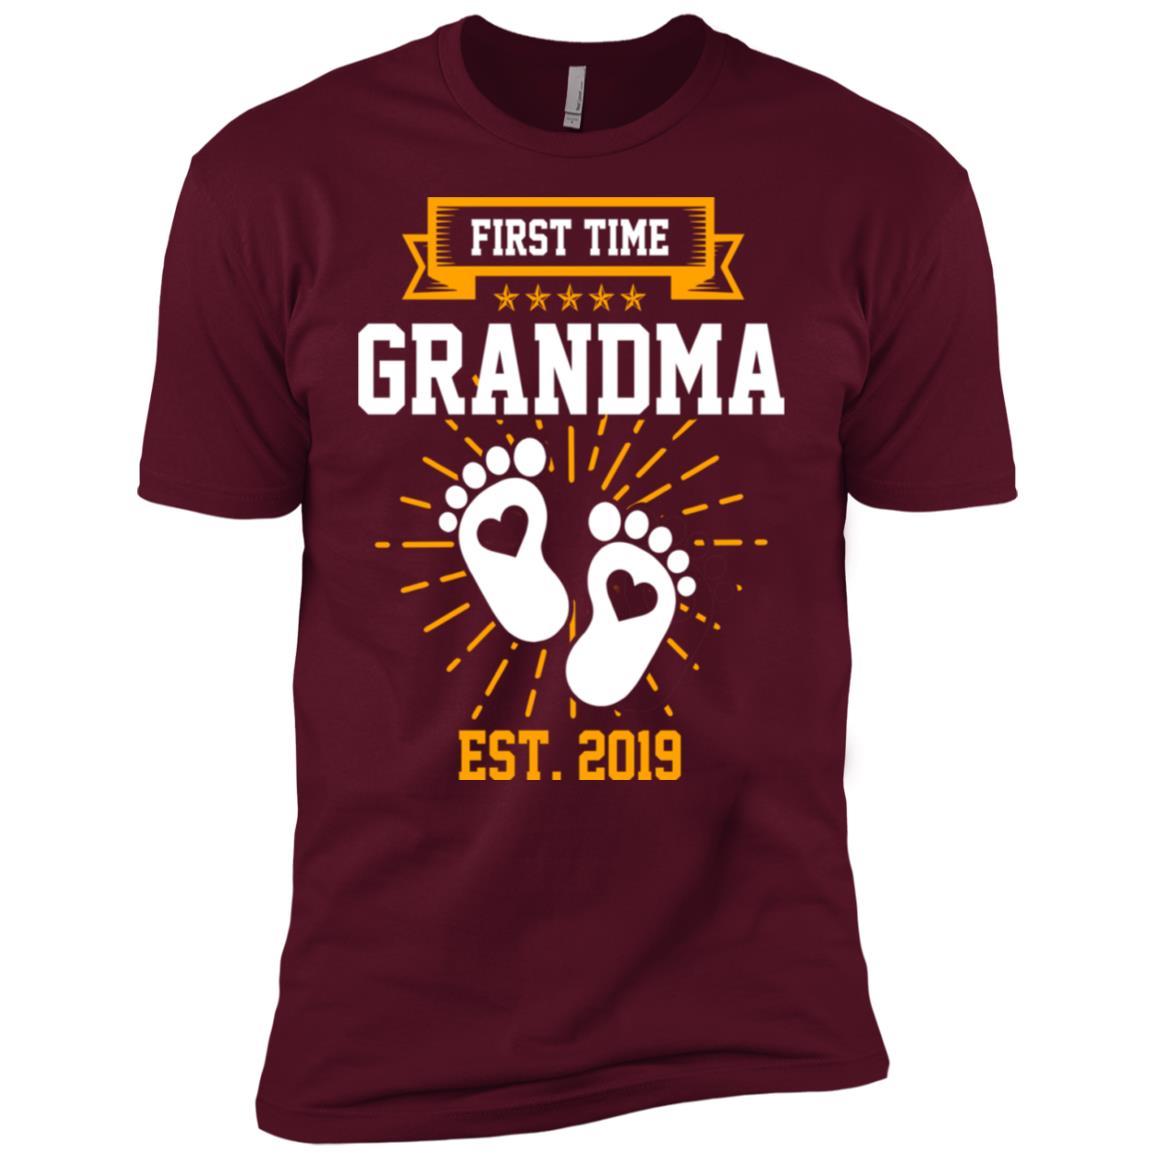 First Time Grandma Est 2019 Gift Men Short Sleeve T-Shirt